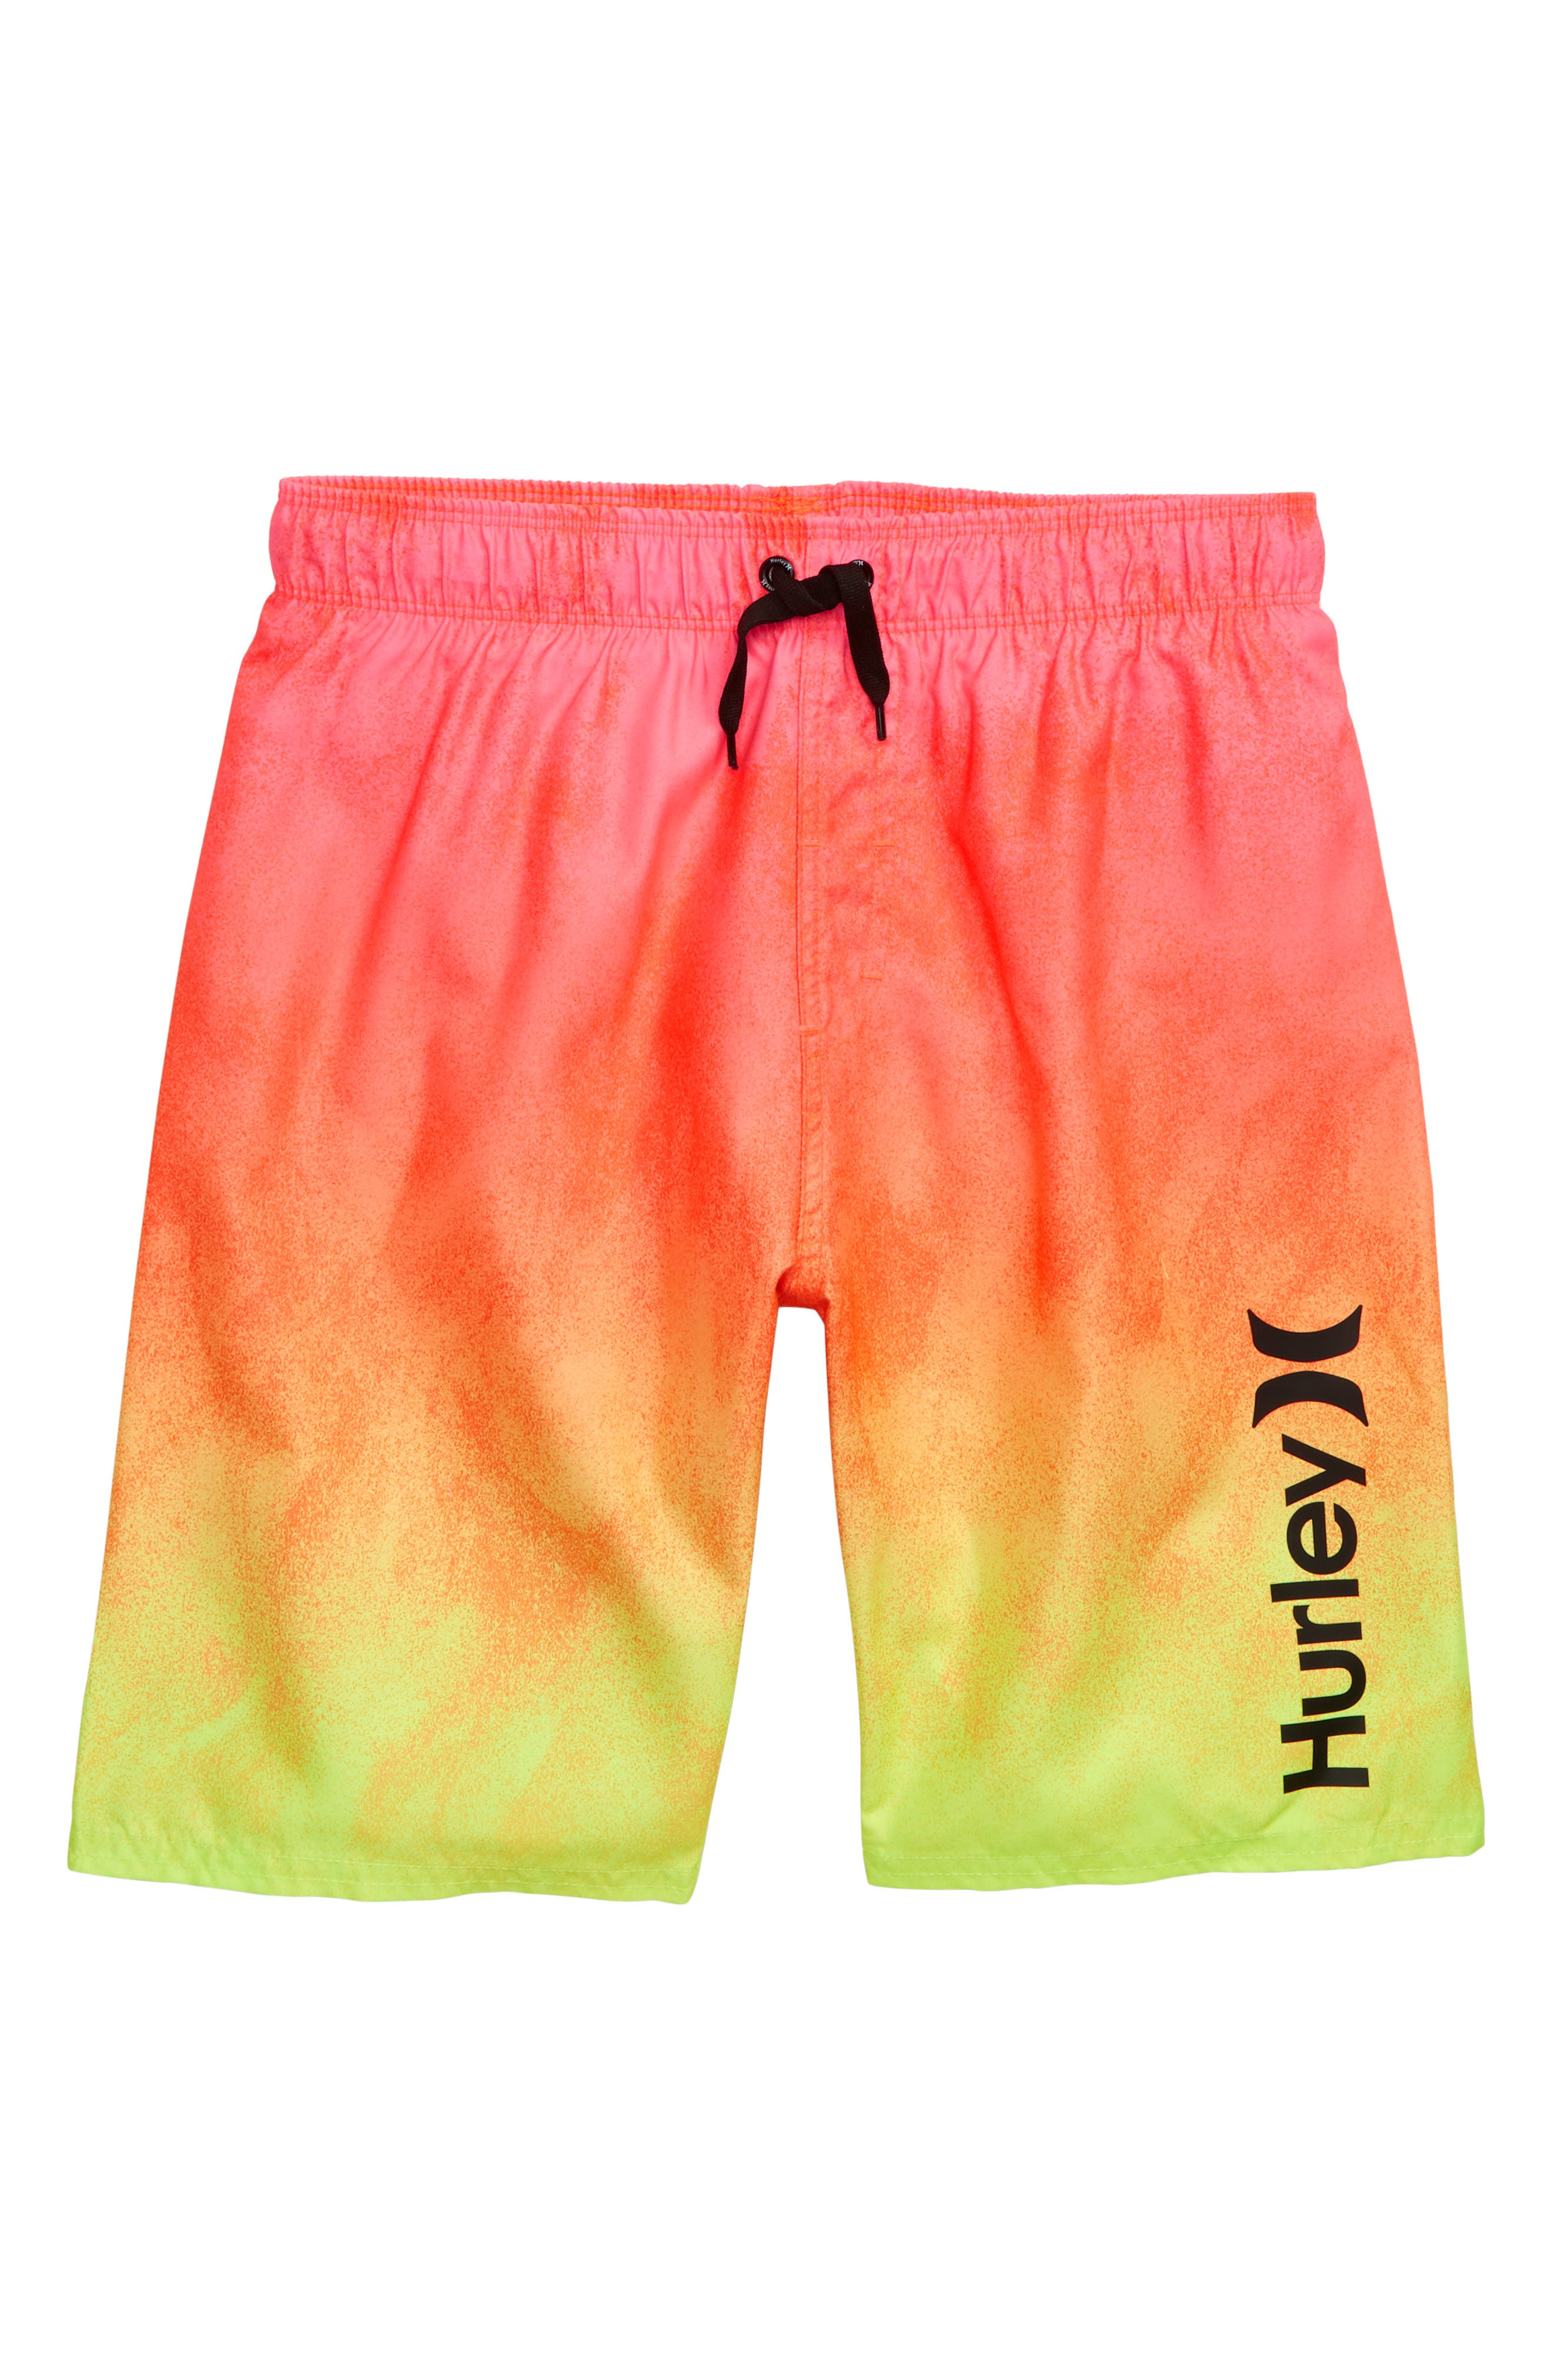 Boys Hurley Gradient Swim Trunks Size 2T  Pink